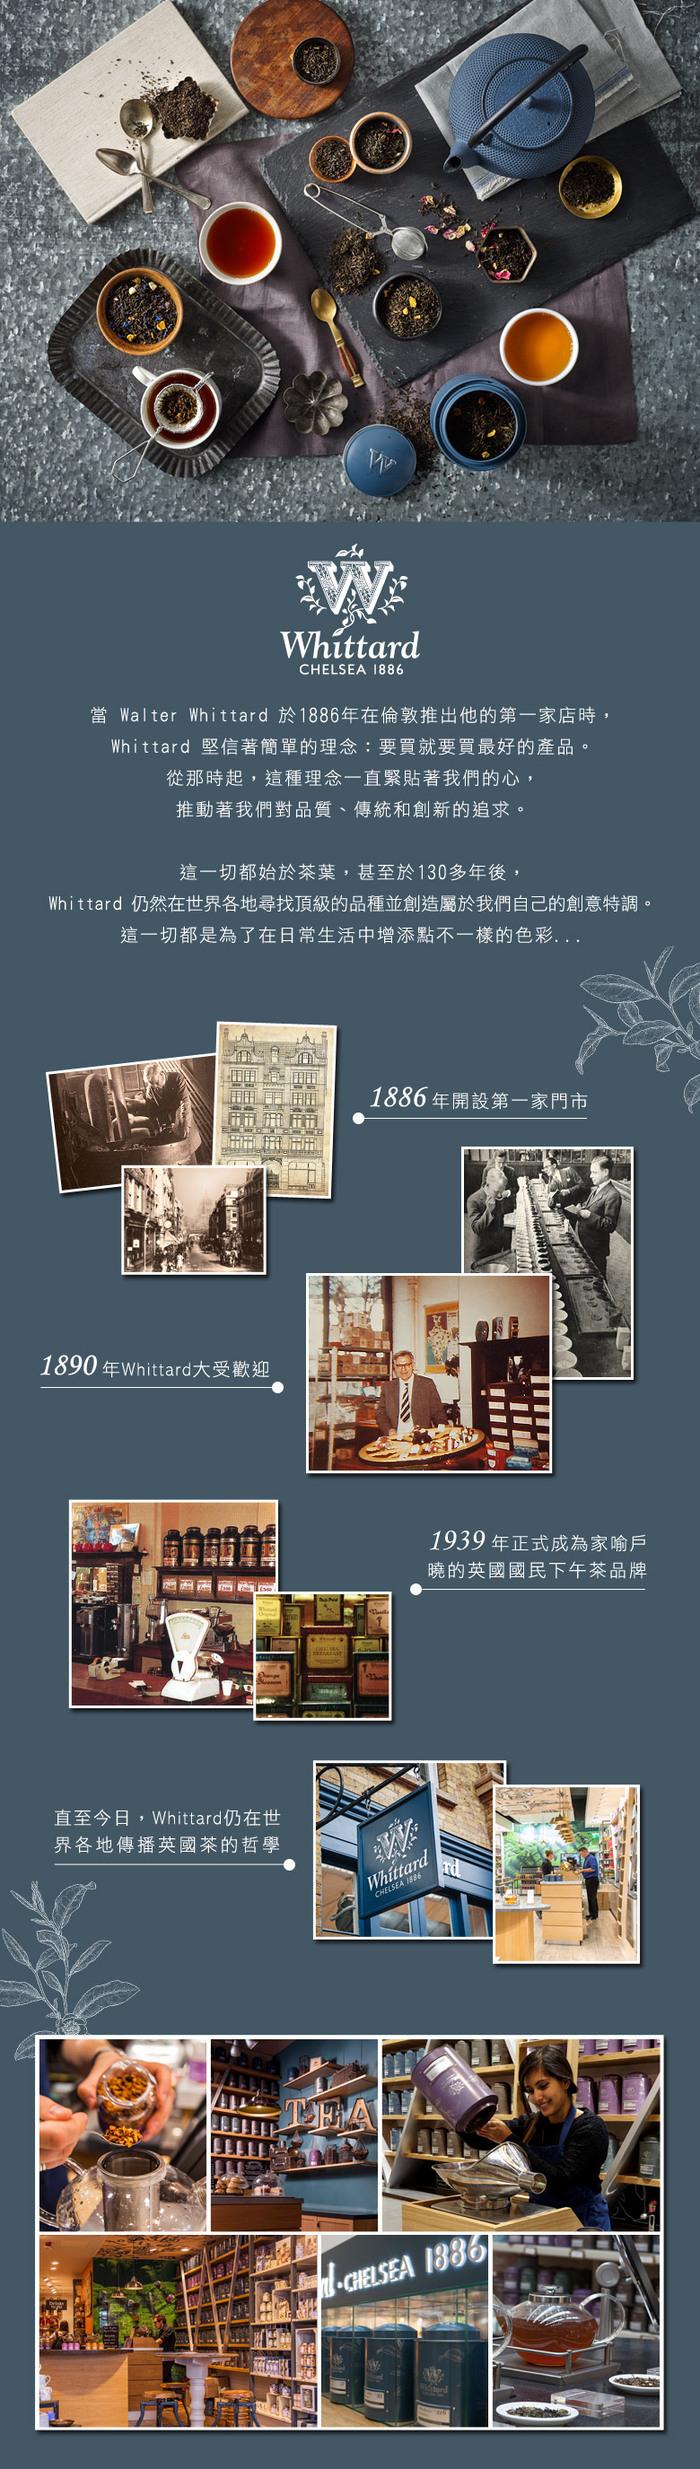 Whittard|熱帶水果烏龍茶-袋裝 Tea Party Oolong NO.106